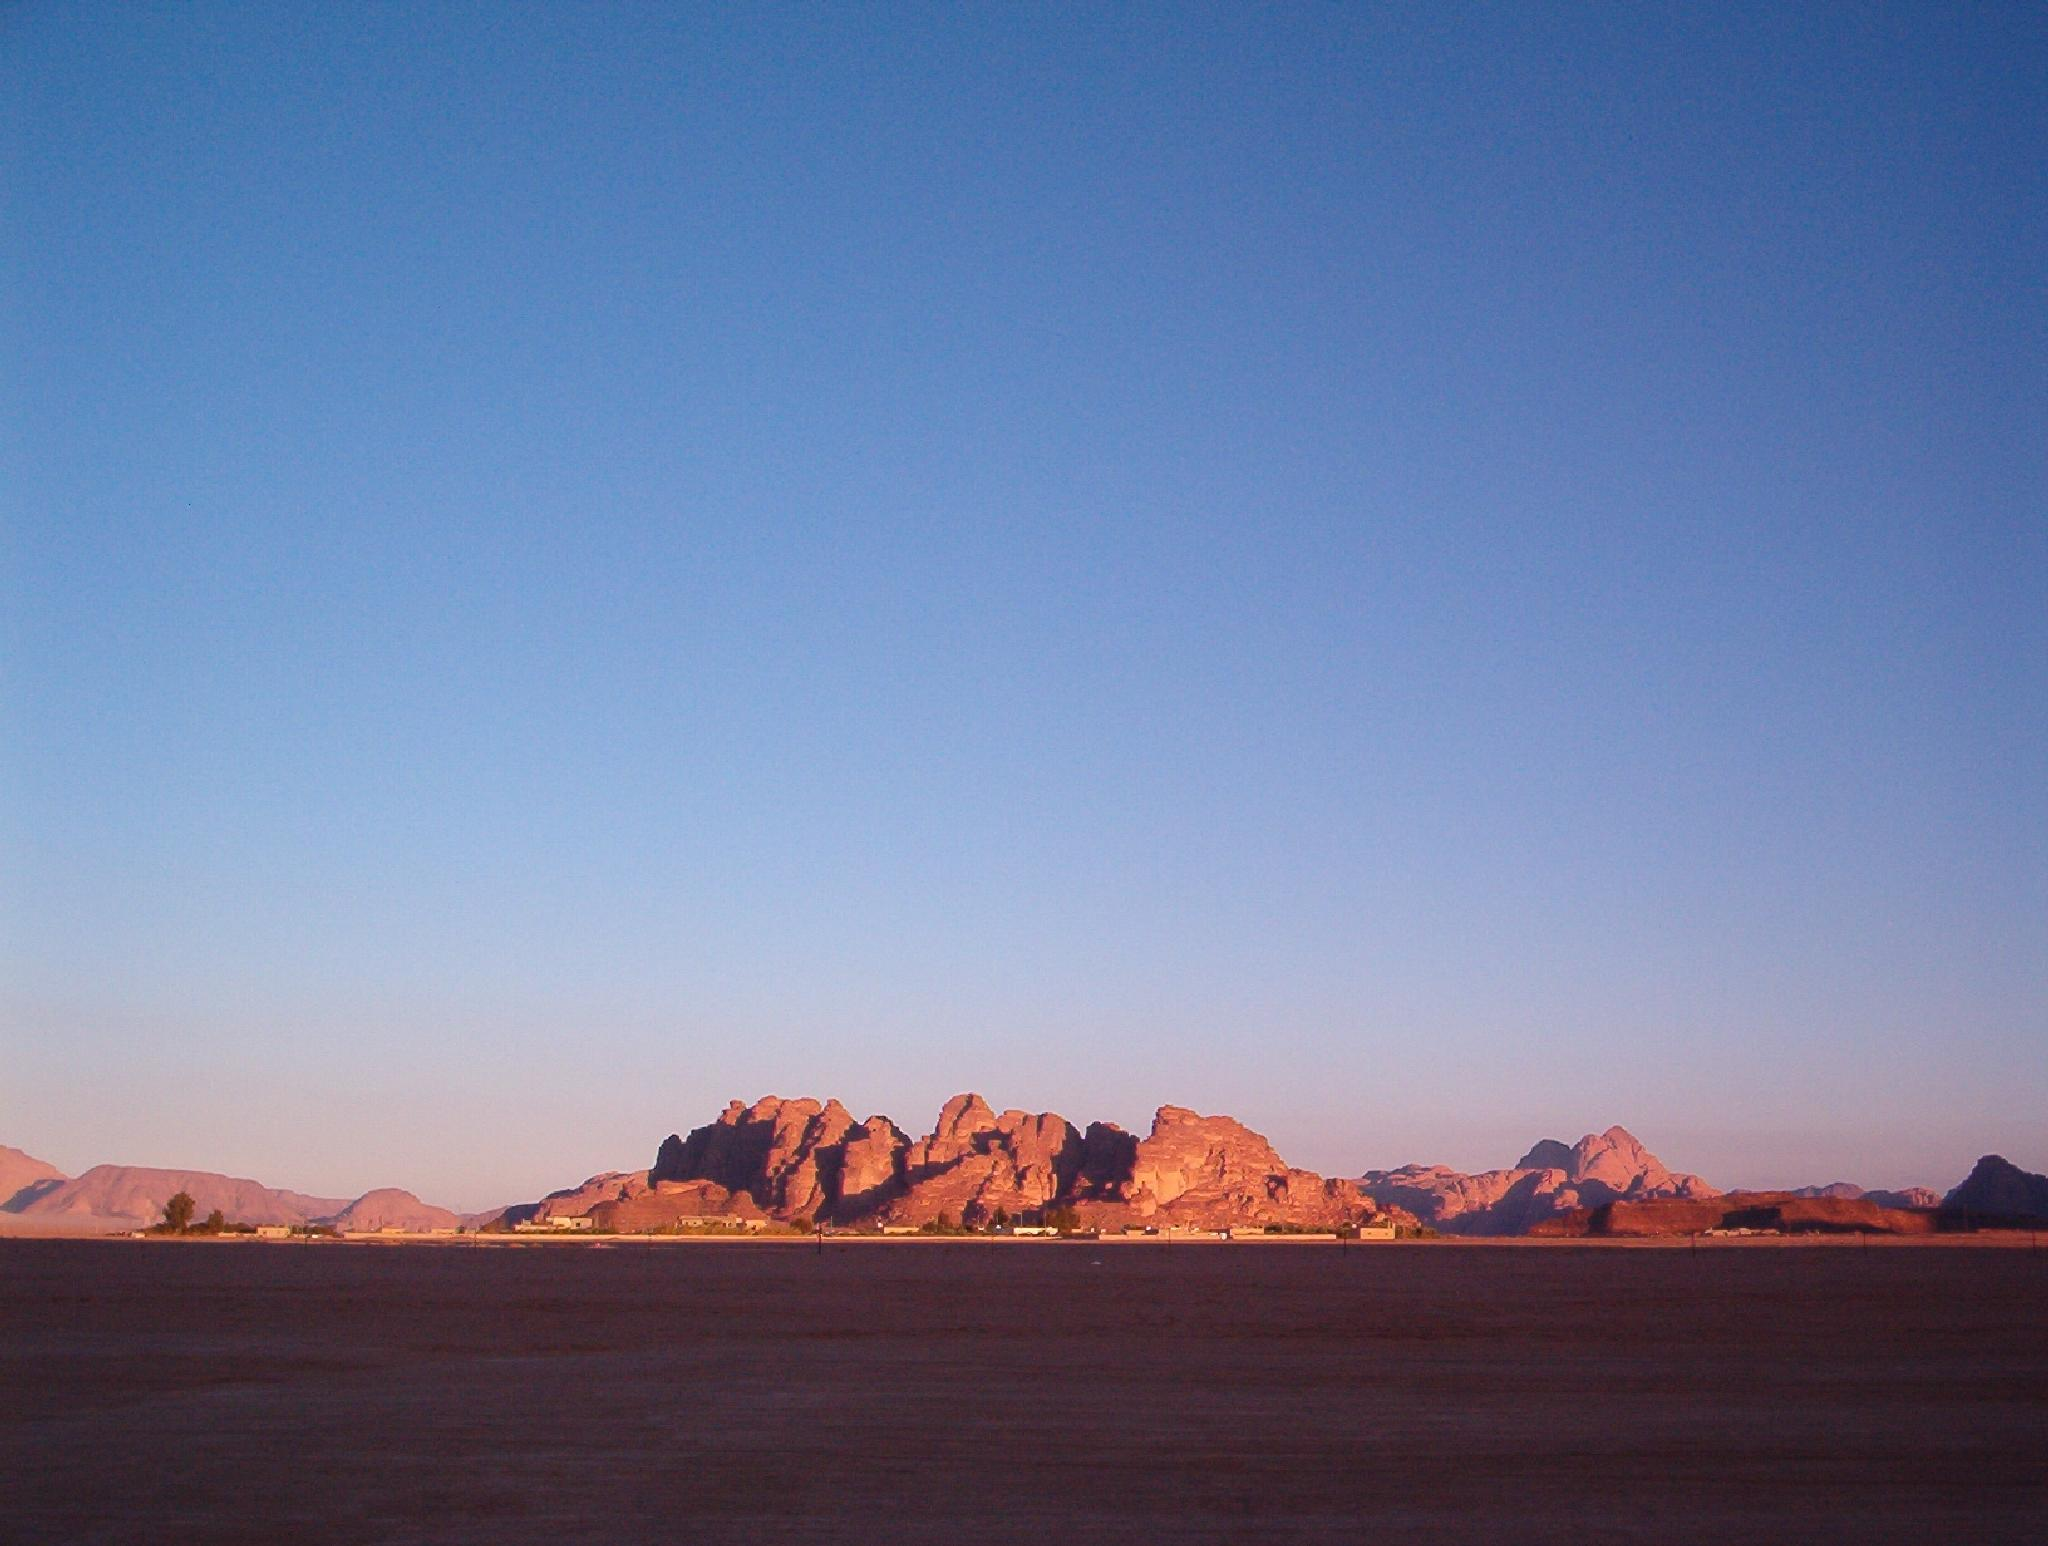 Almost Sunset by elizabeth.bragg.90